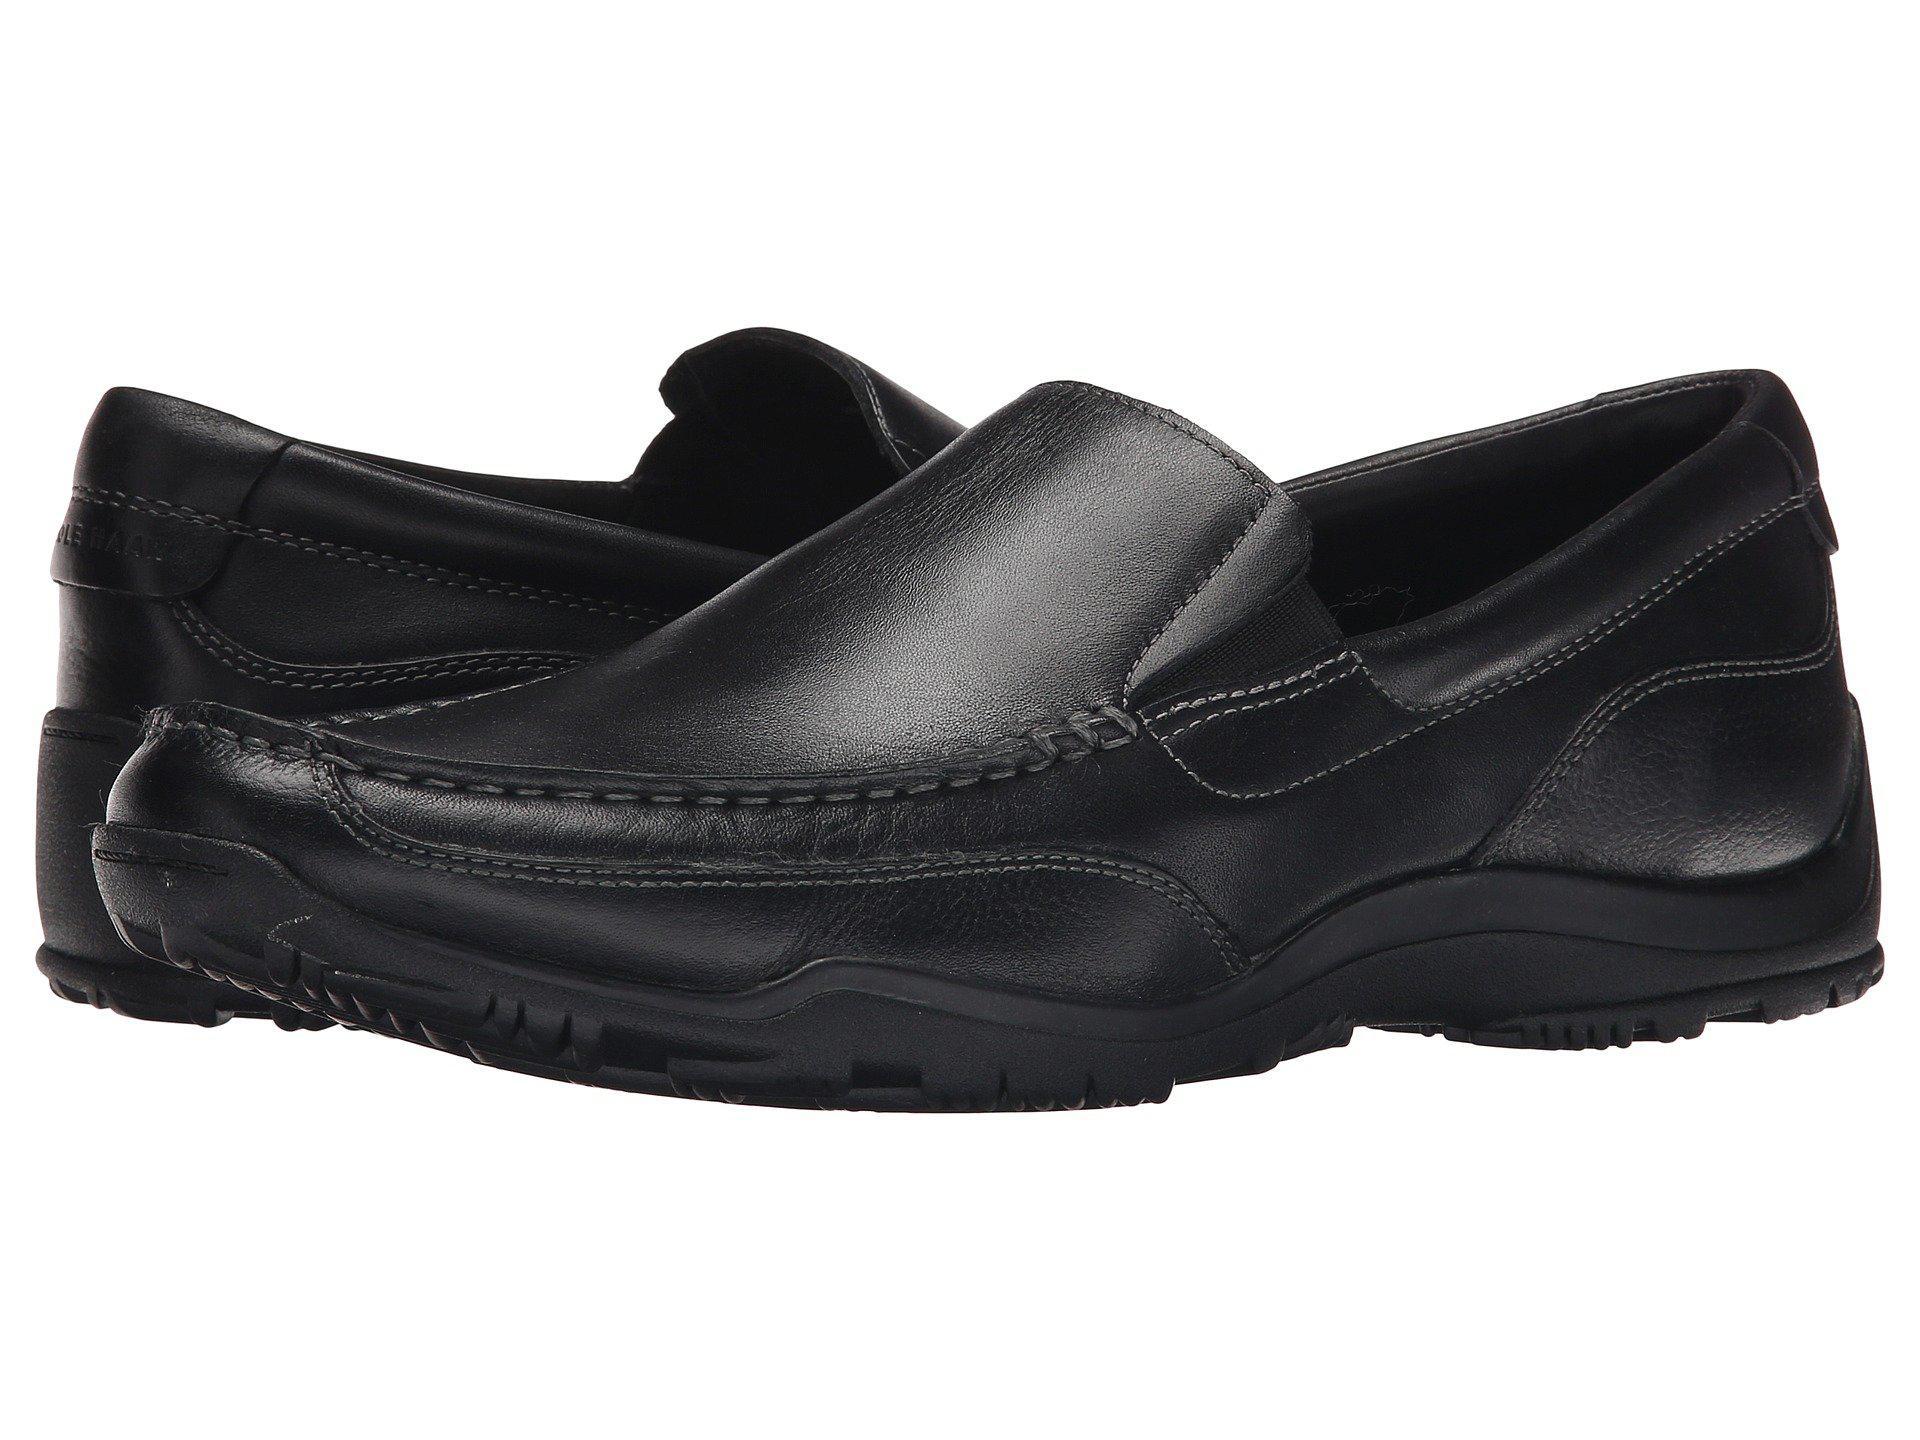 7f12725df81 Lyst - Cole Haan Hughes Grand Slip-on Ii in Black for Men